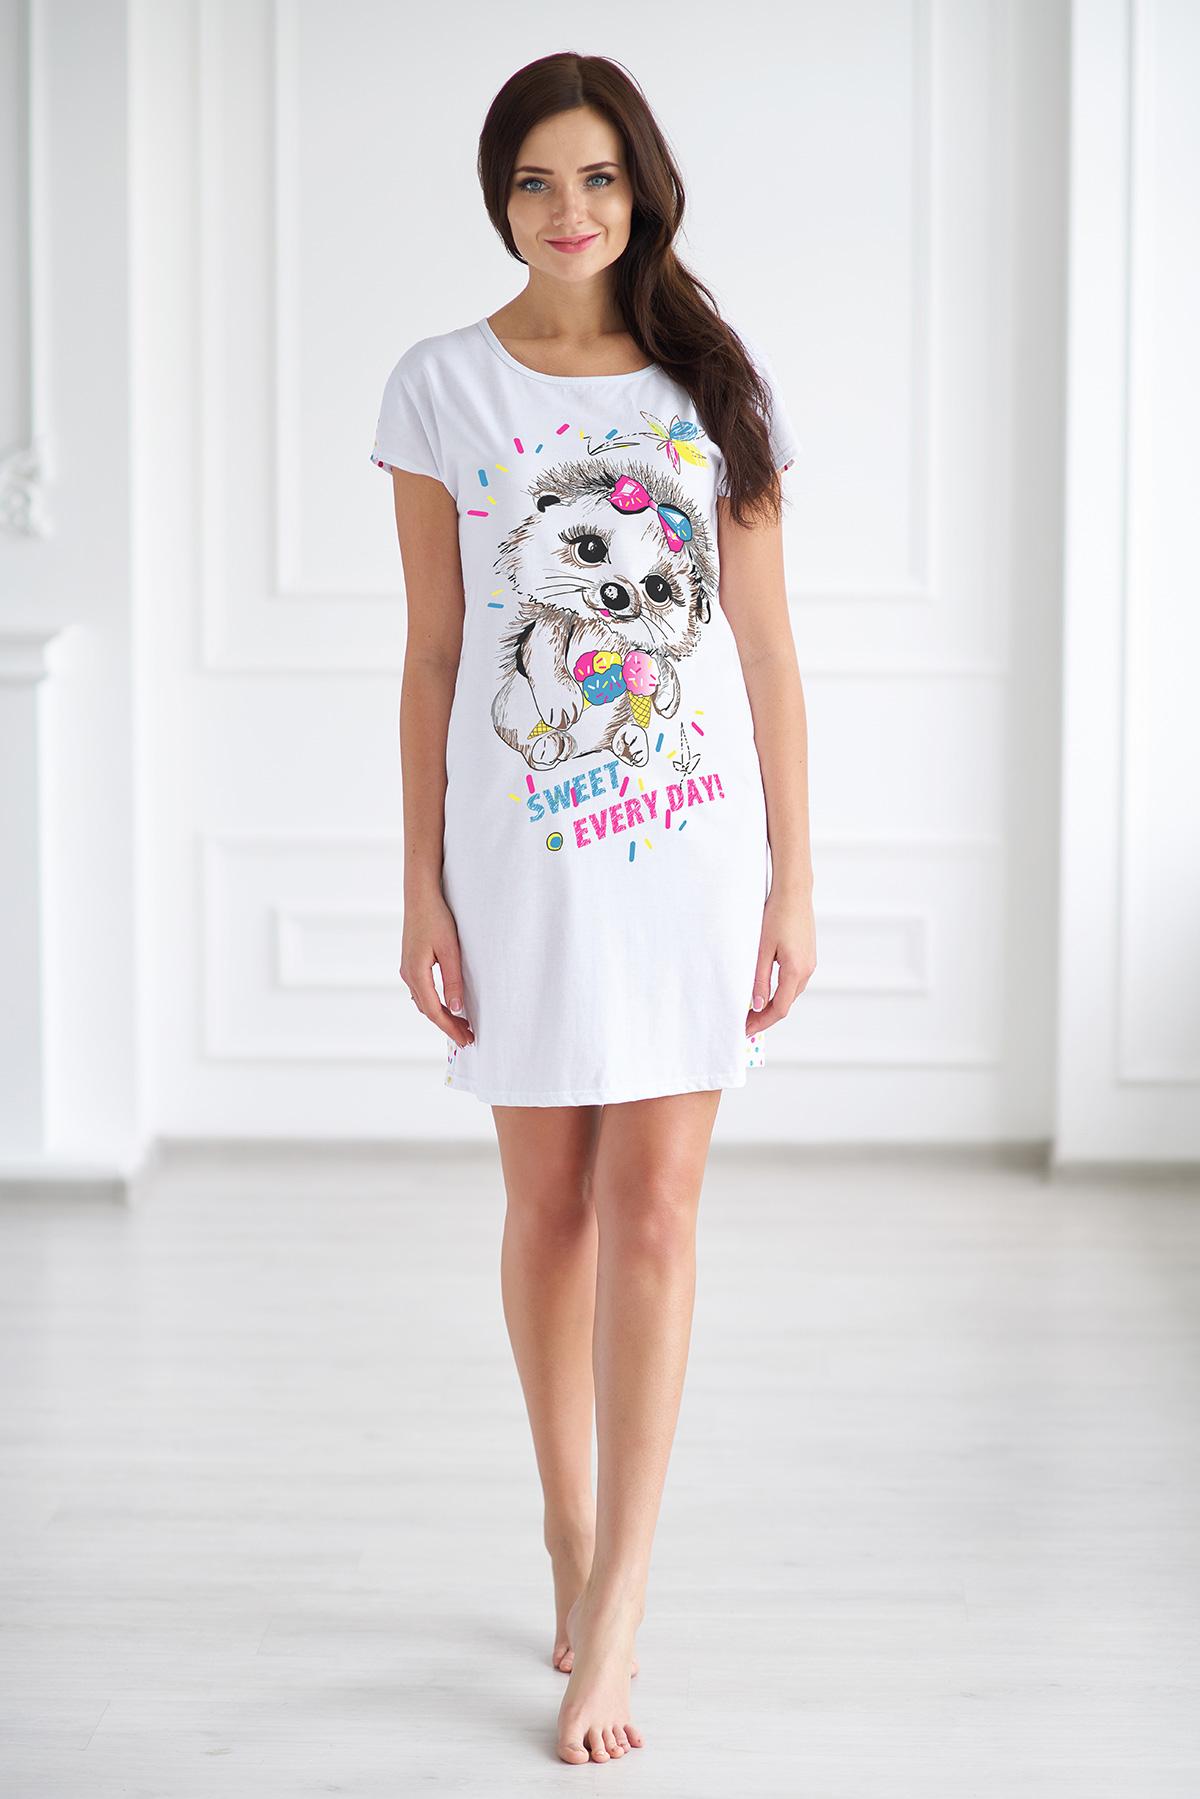 Жен. футболка арт. 19-0117 р. 48Майки и футболки<br><br><br>Тип: Жен. футболка<br>Размер: 48<br>Материал: -